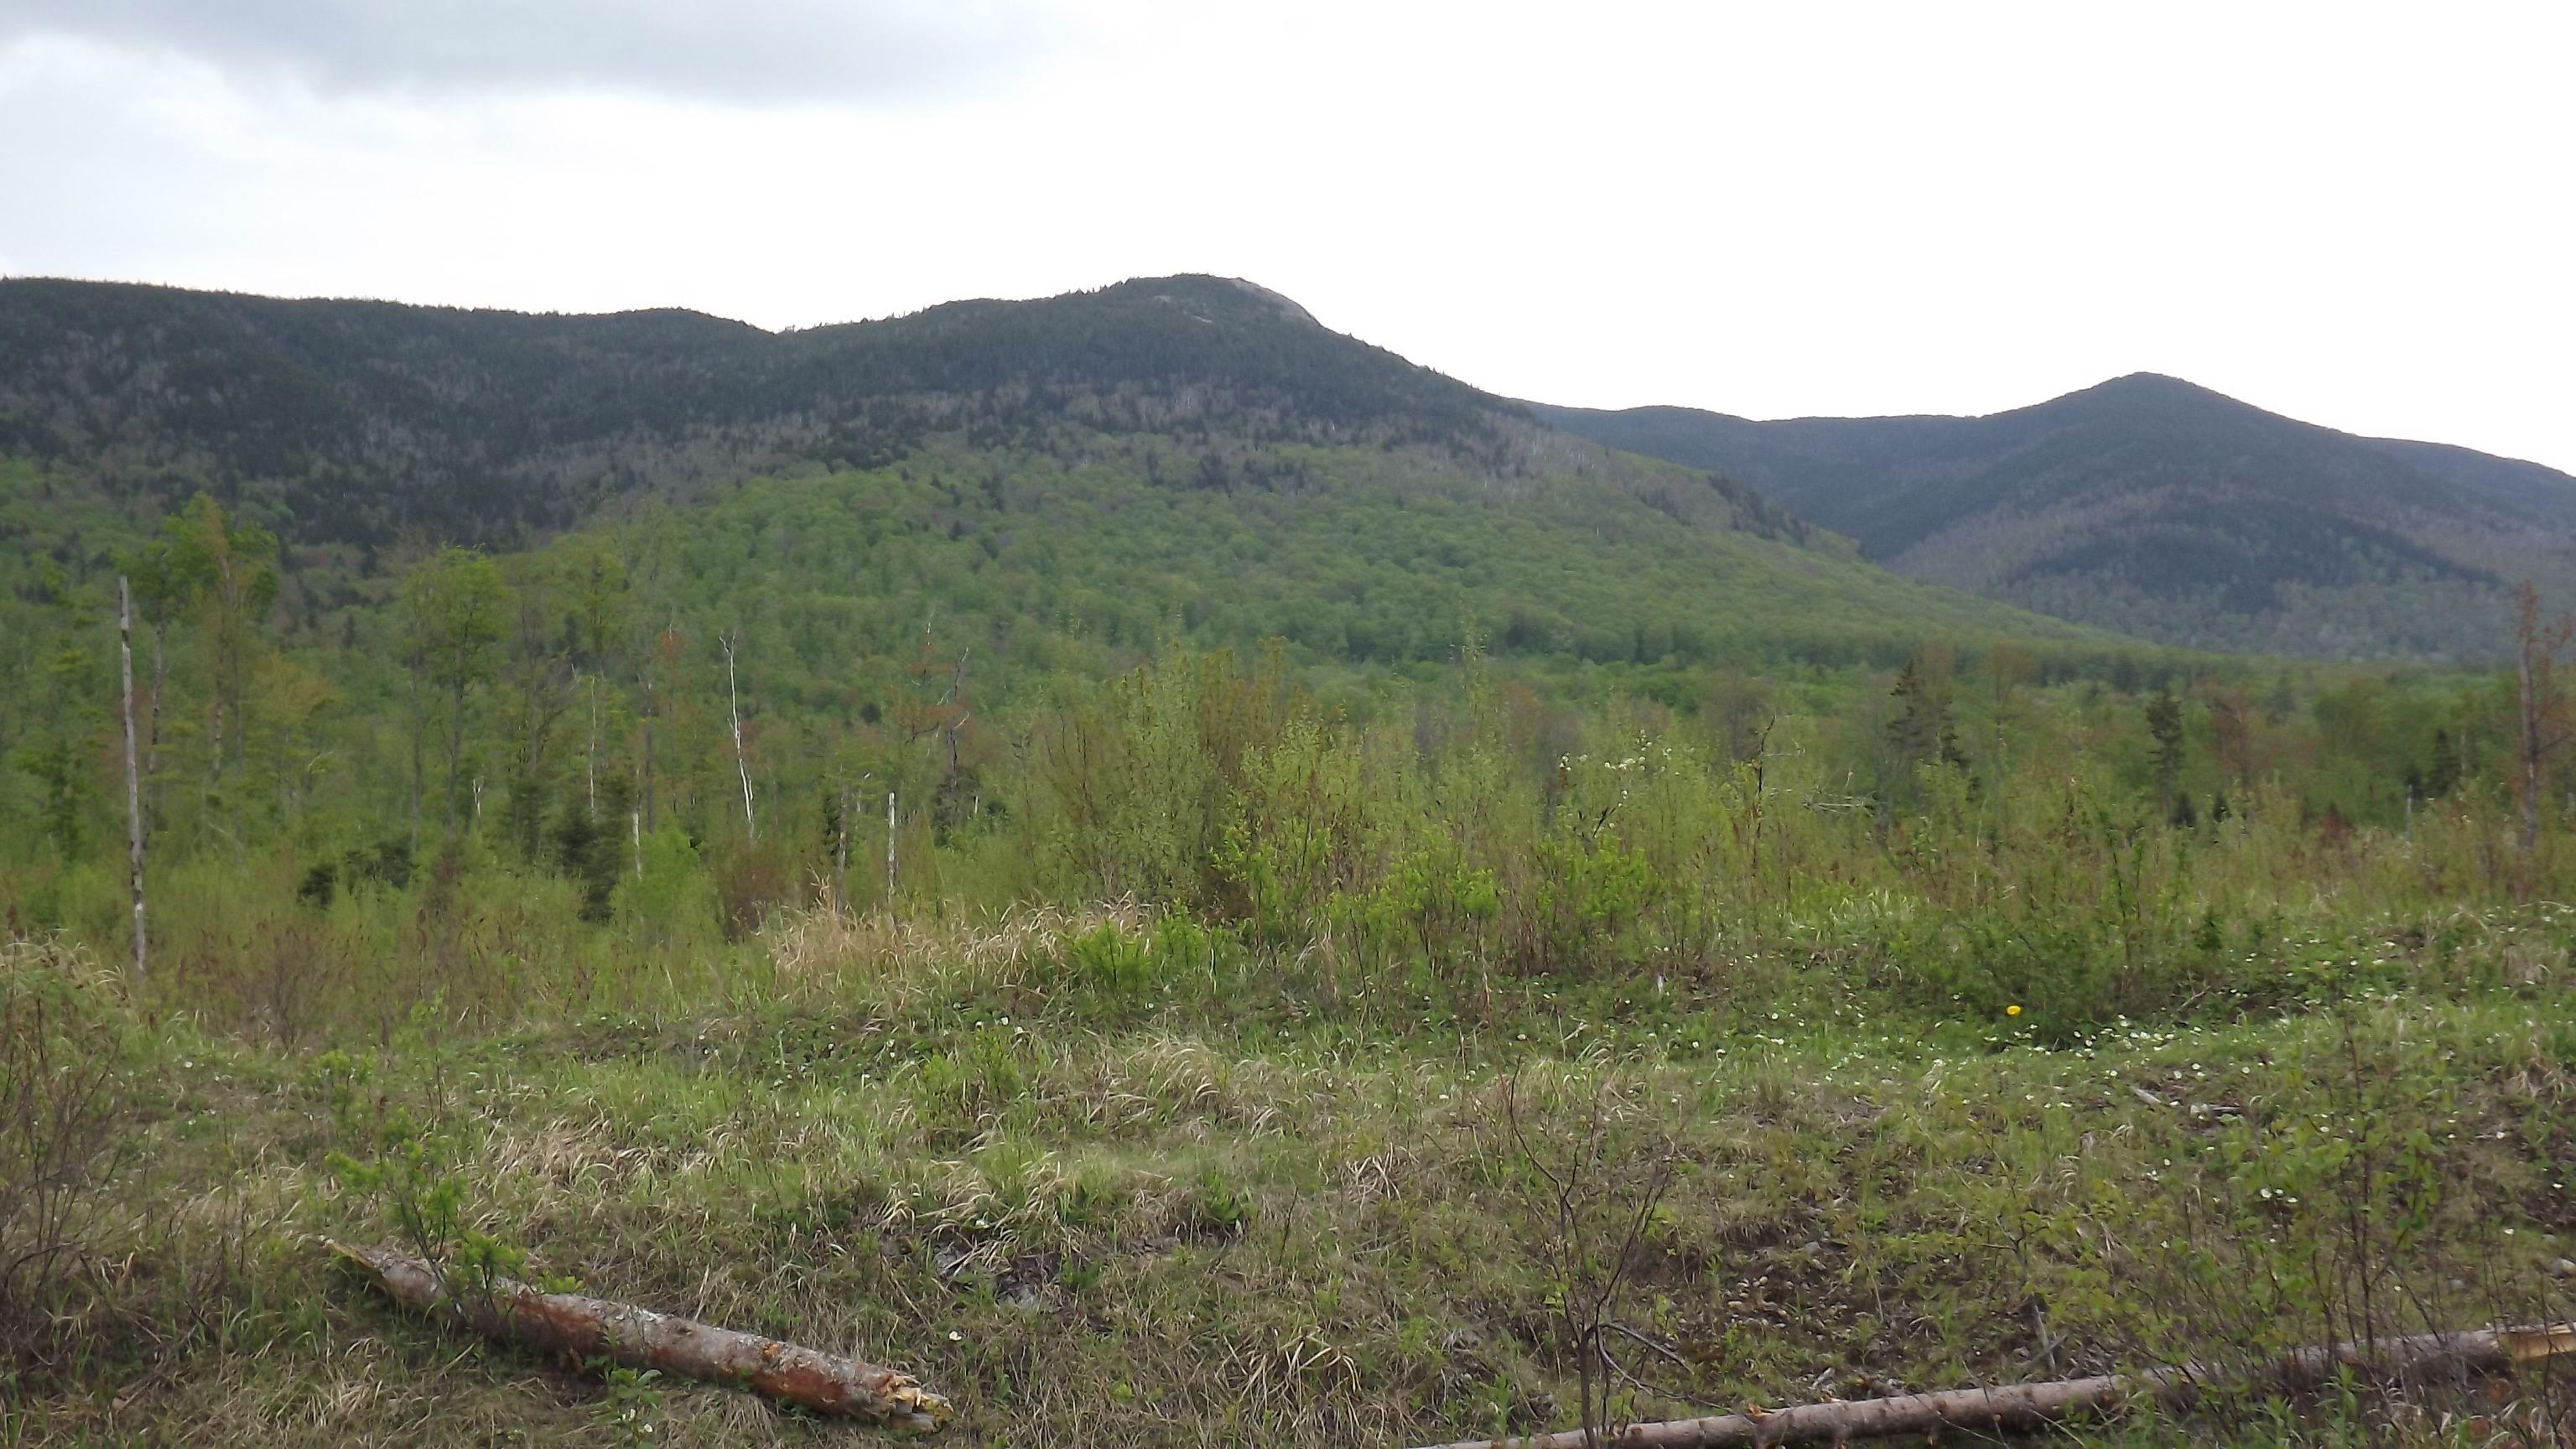 Success Mt  New Hampshire May 2013